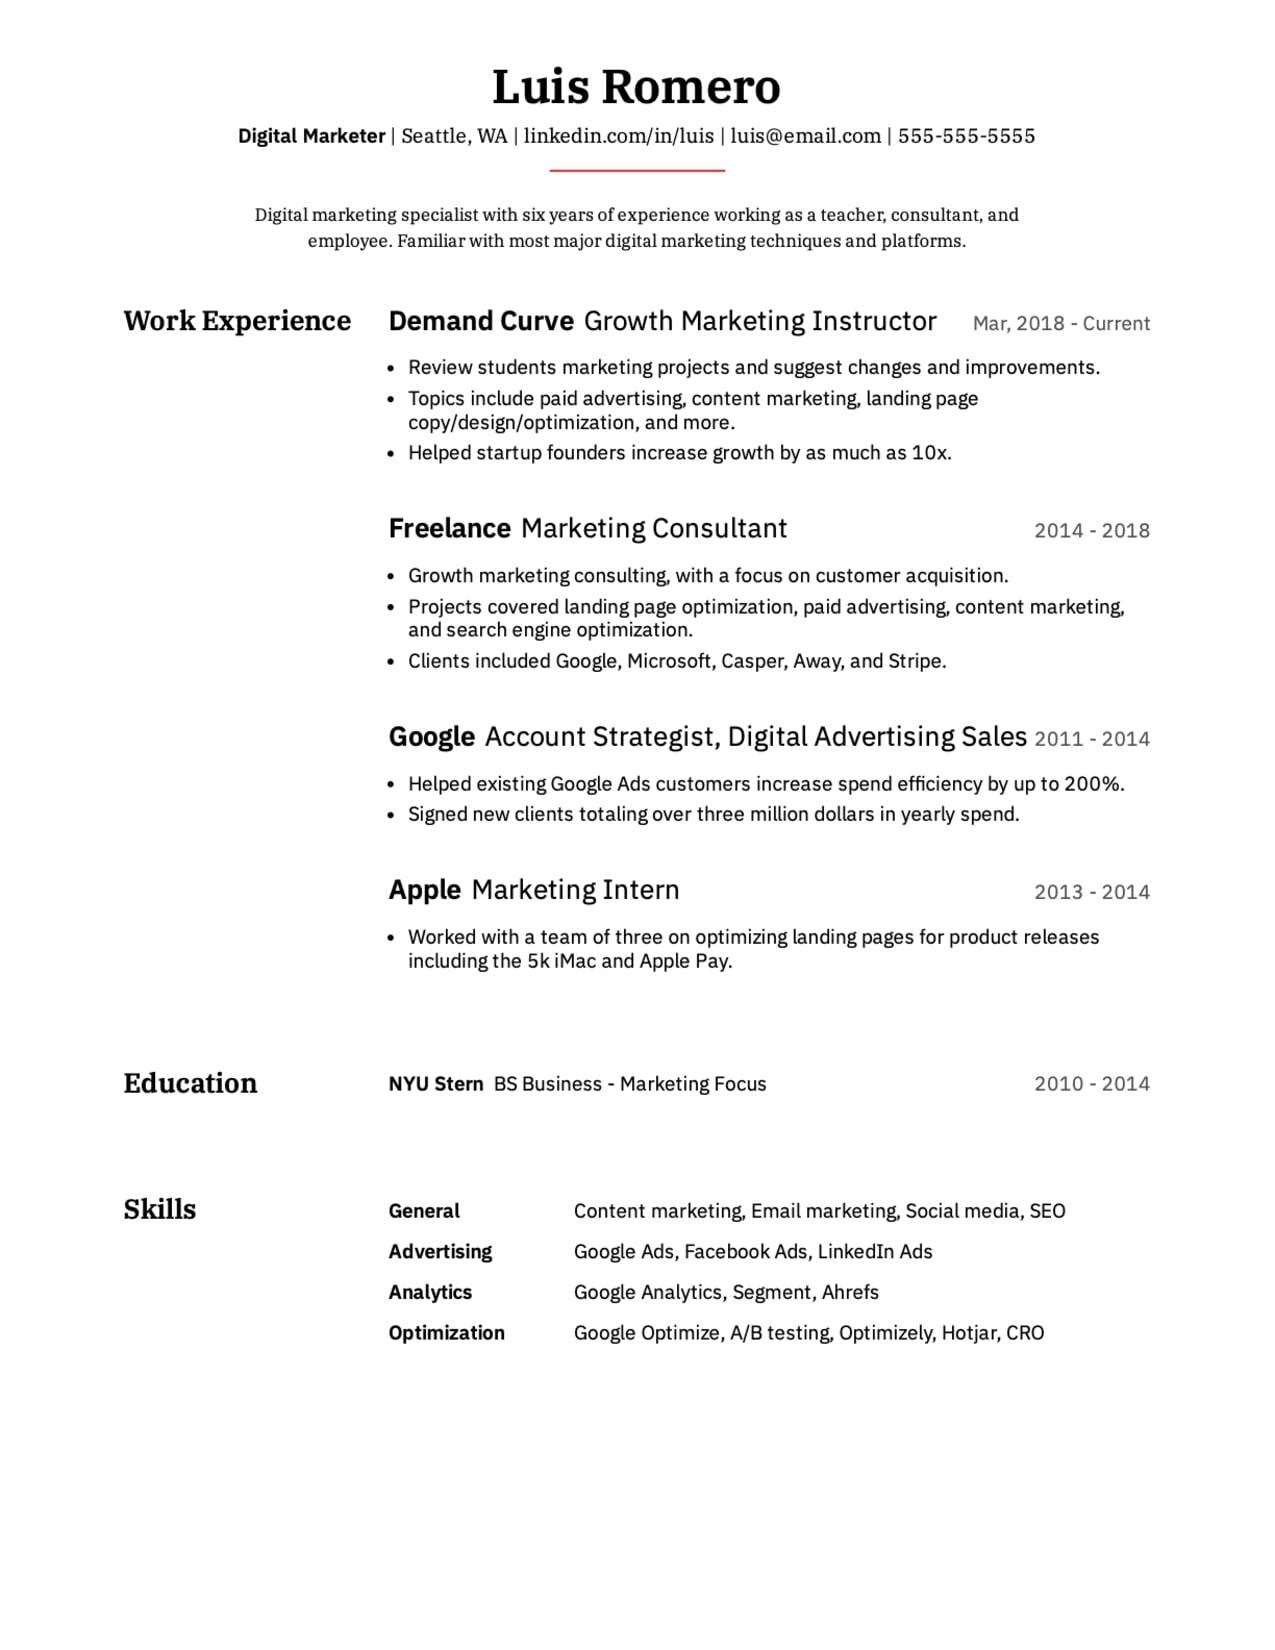 Professional Digital Marketer resume sample.